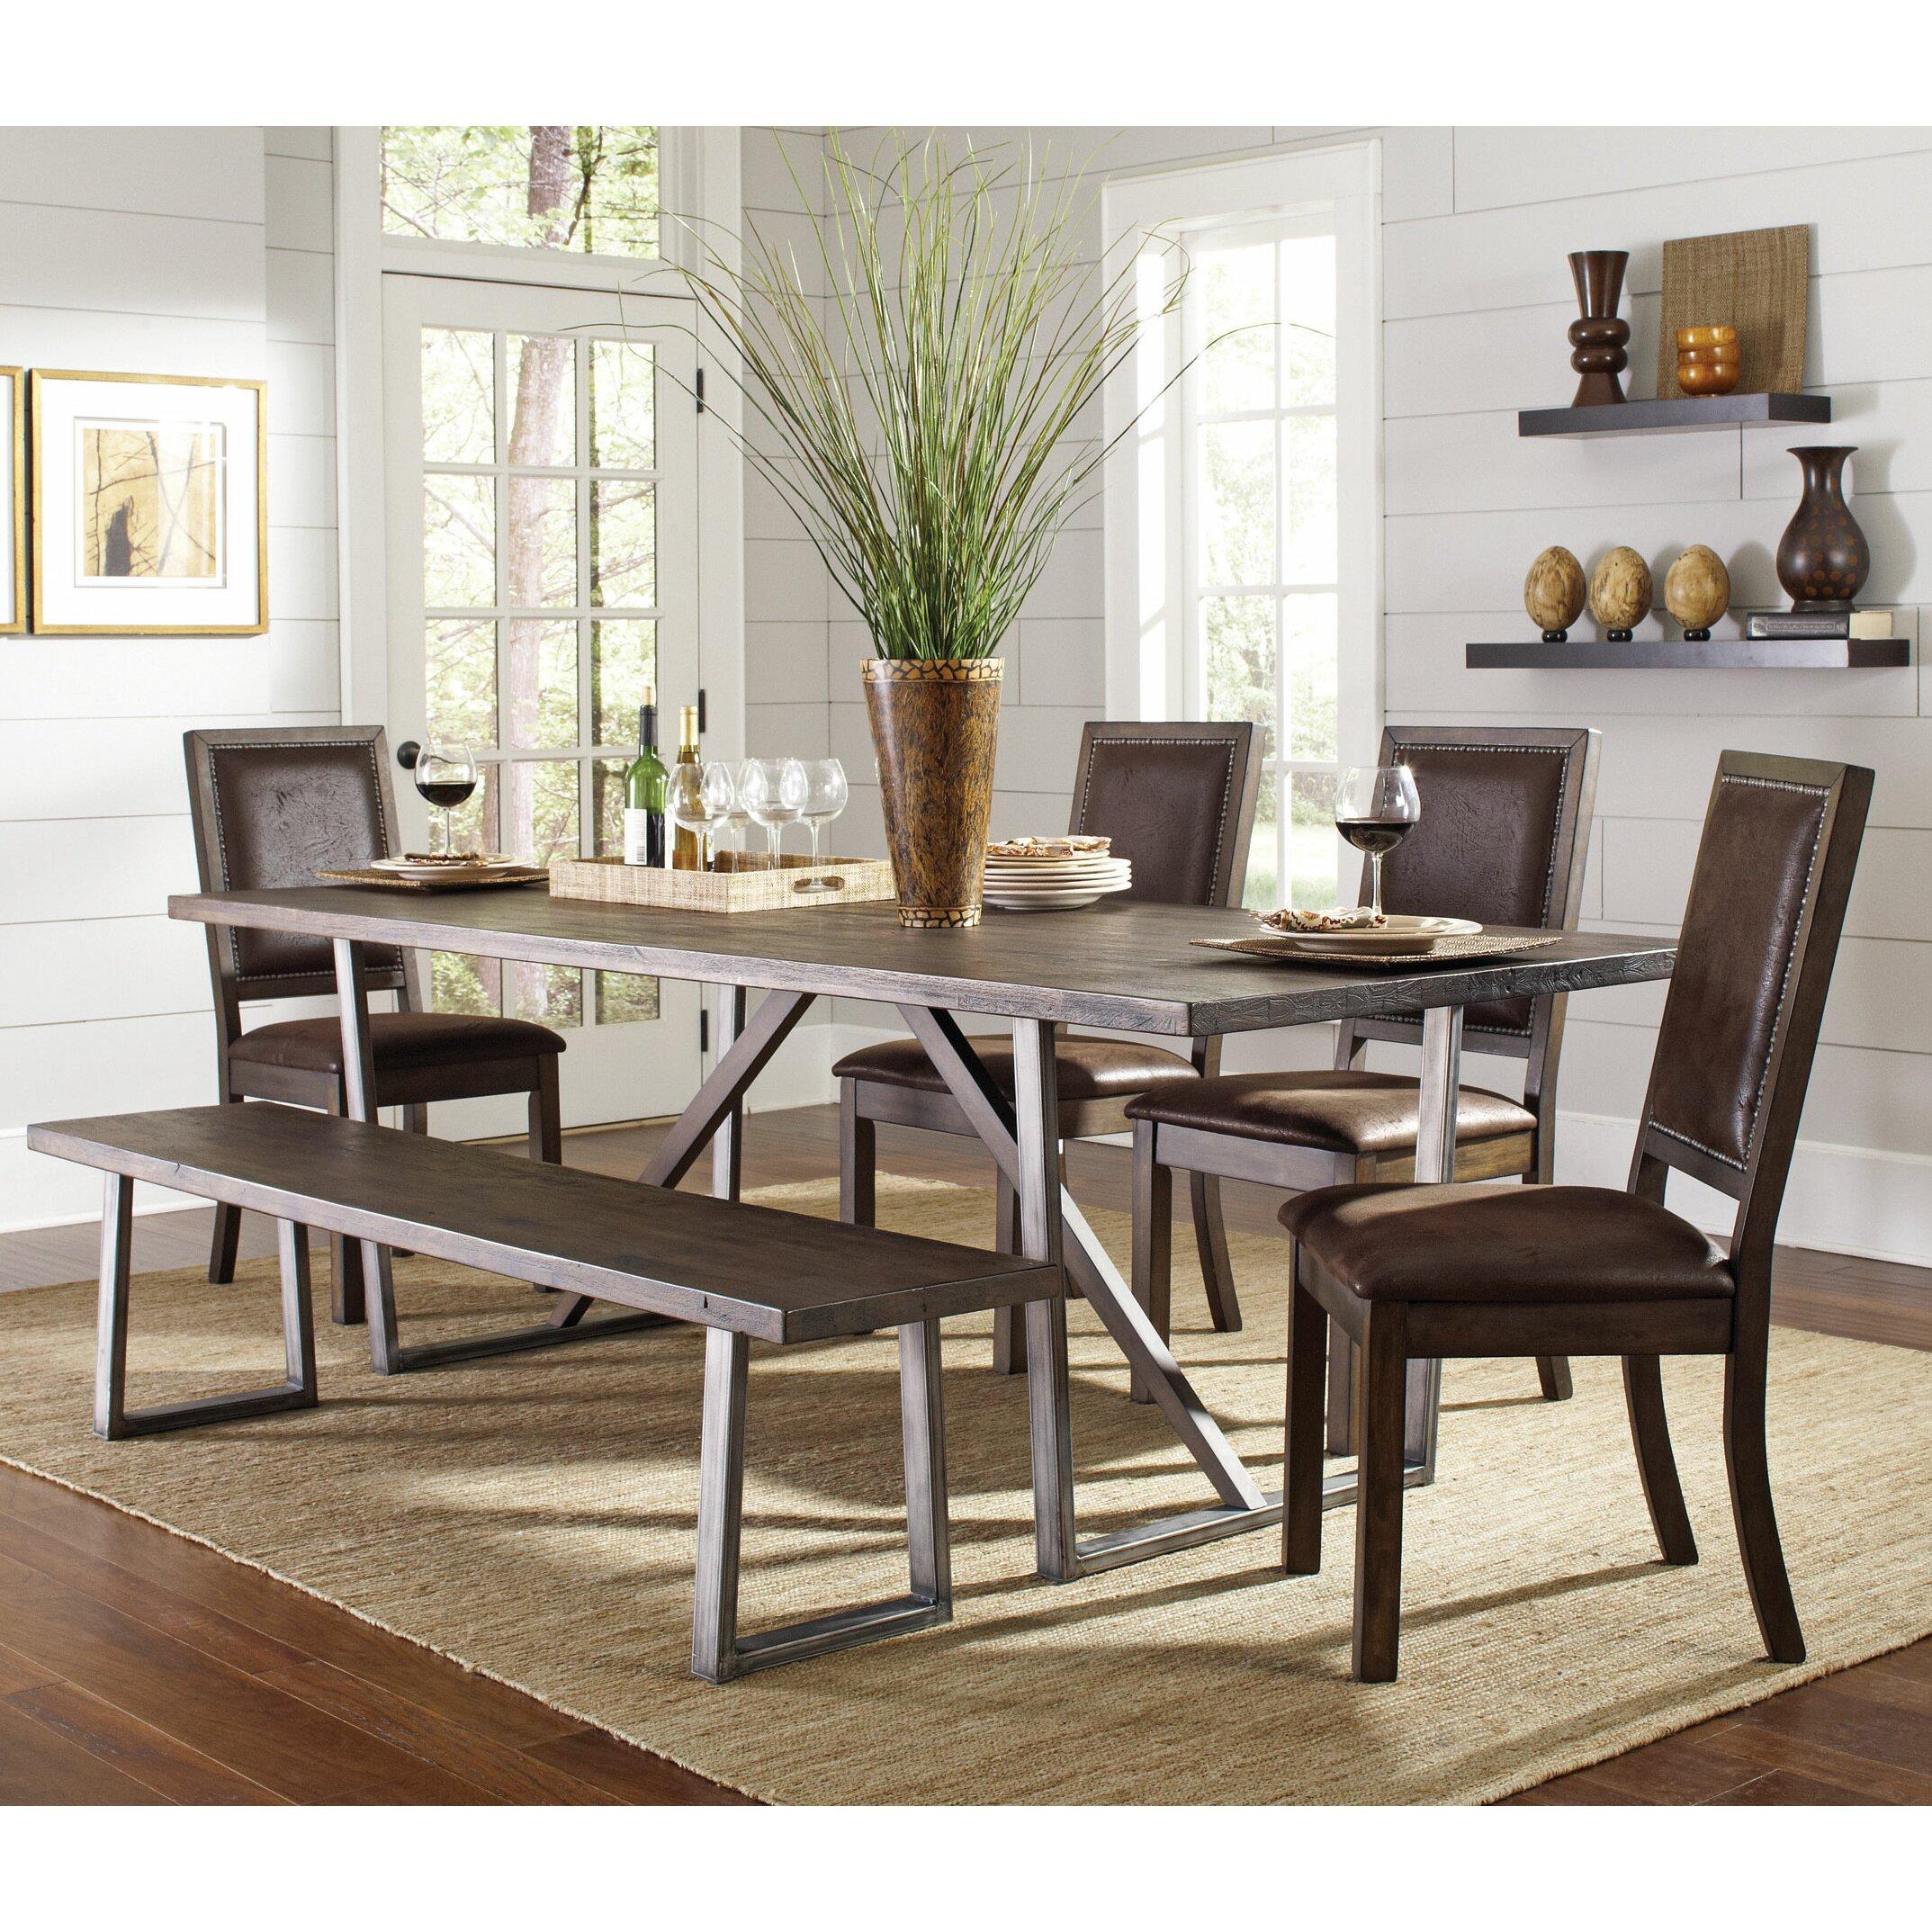 Wildon home genoa dining table wayfair for Wildon home dining